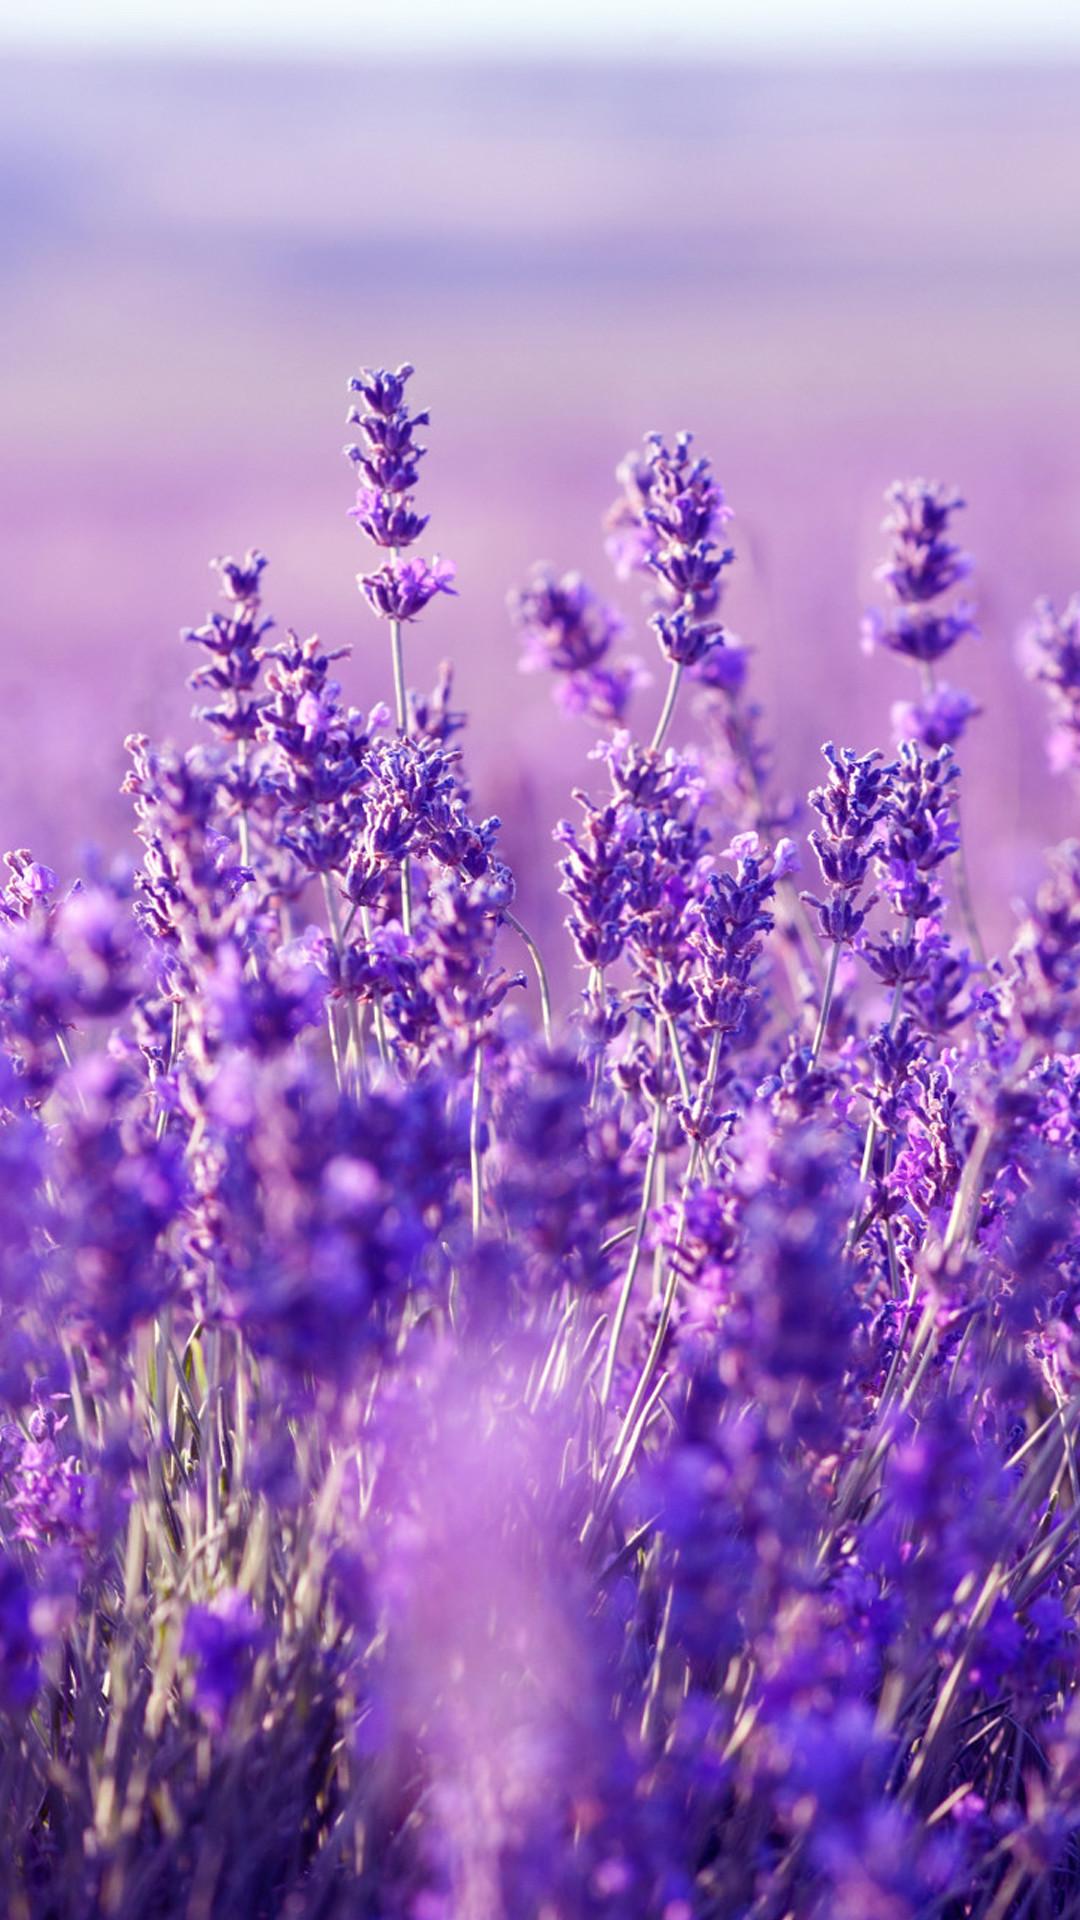 Beautiful Lavender Wallpaper: HD Lavender Mobile Background –  https://helpyourselfimages.com